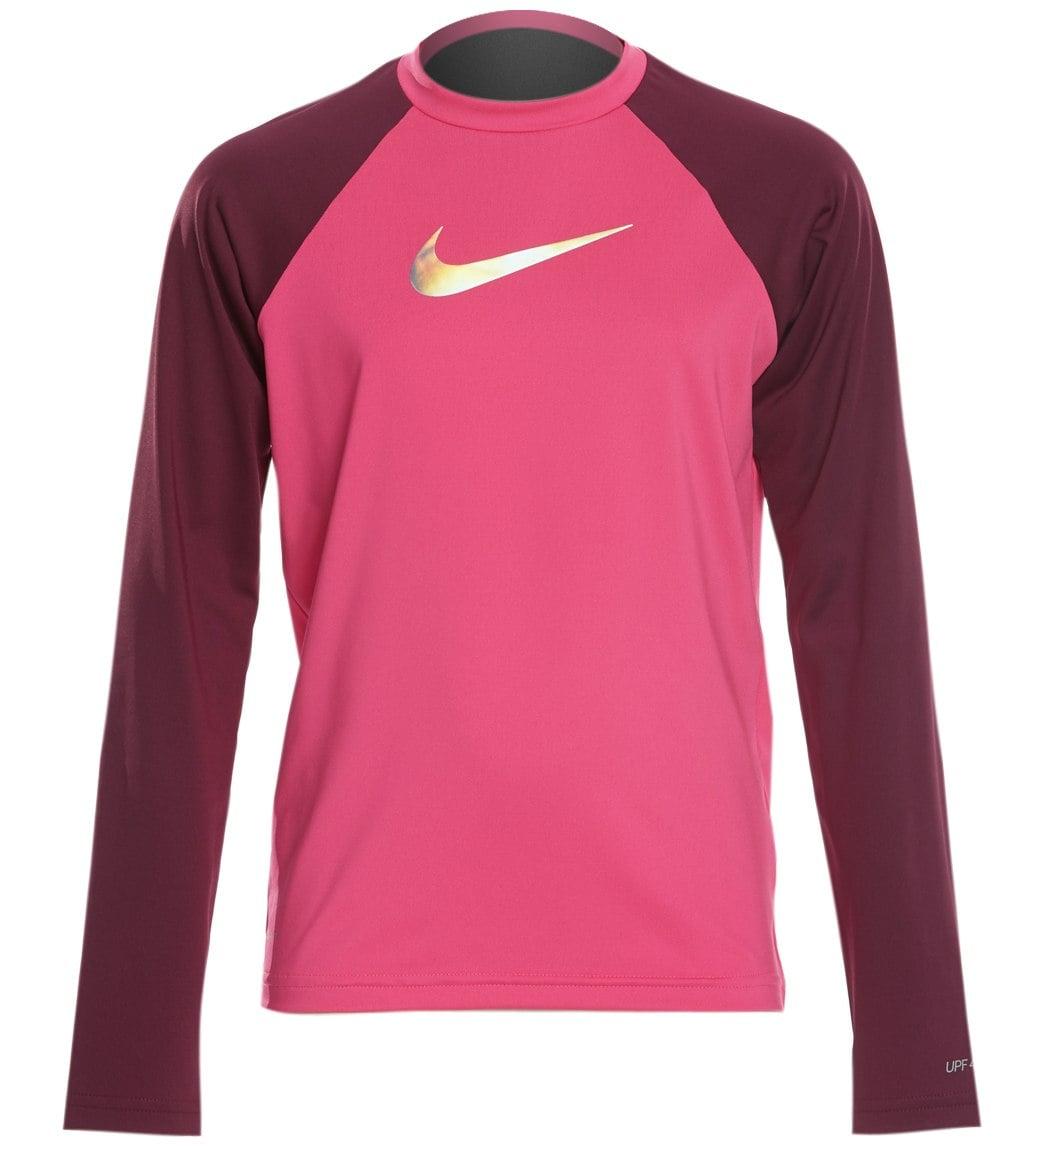 14d0daa641 Nike Girls' Flash Long Sleeve Rash Guard (Big Kid) at SwimOutlet.com